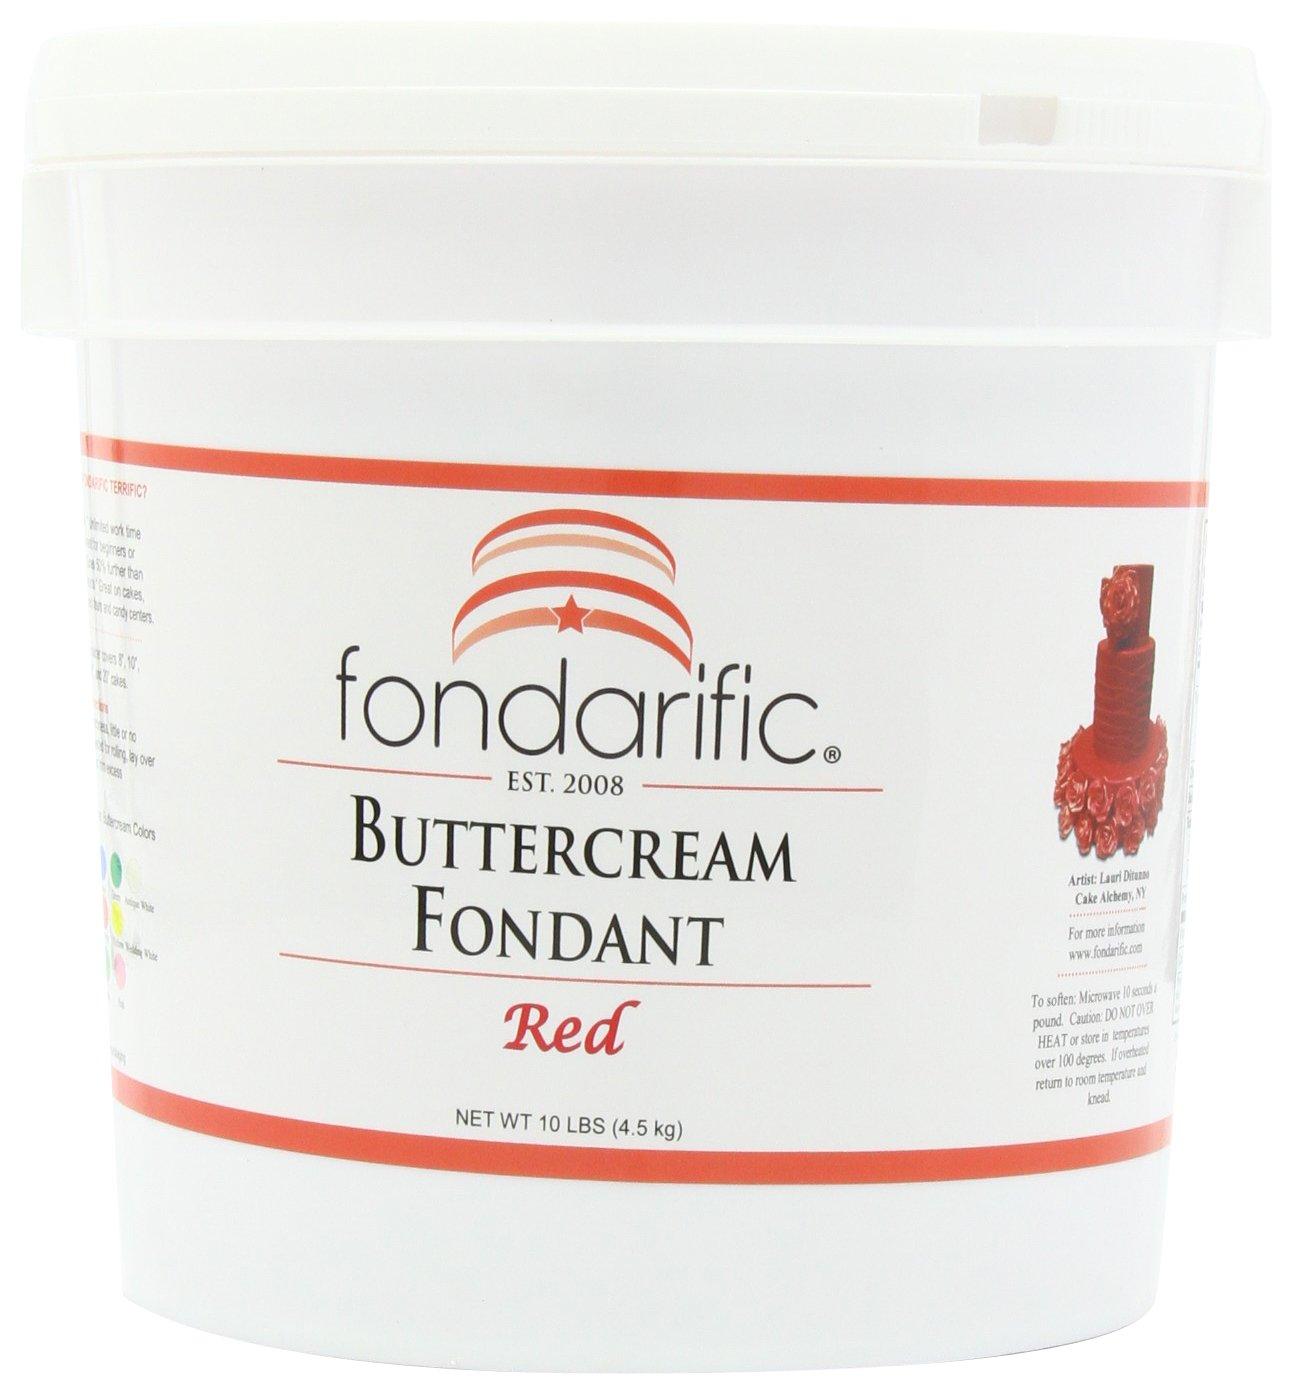 Fondarific Buttercream Red Fondant, 10-Pound Bucket